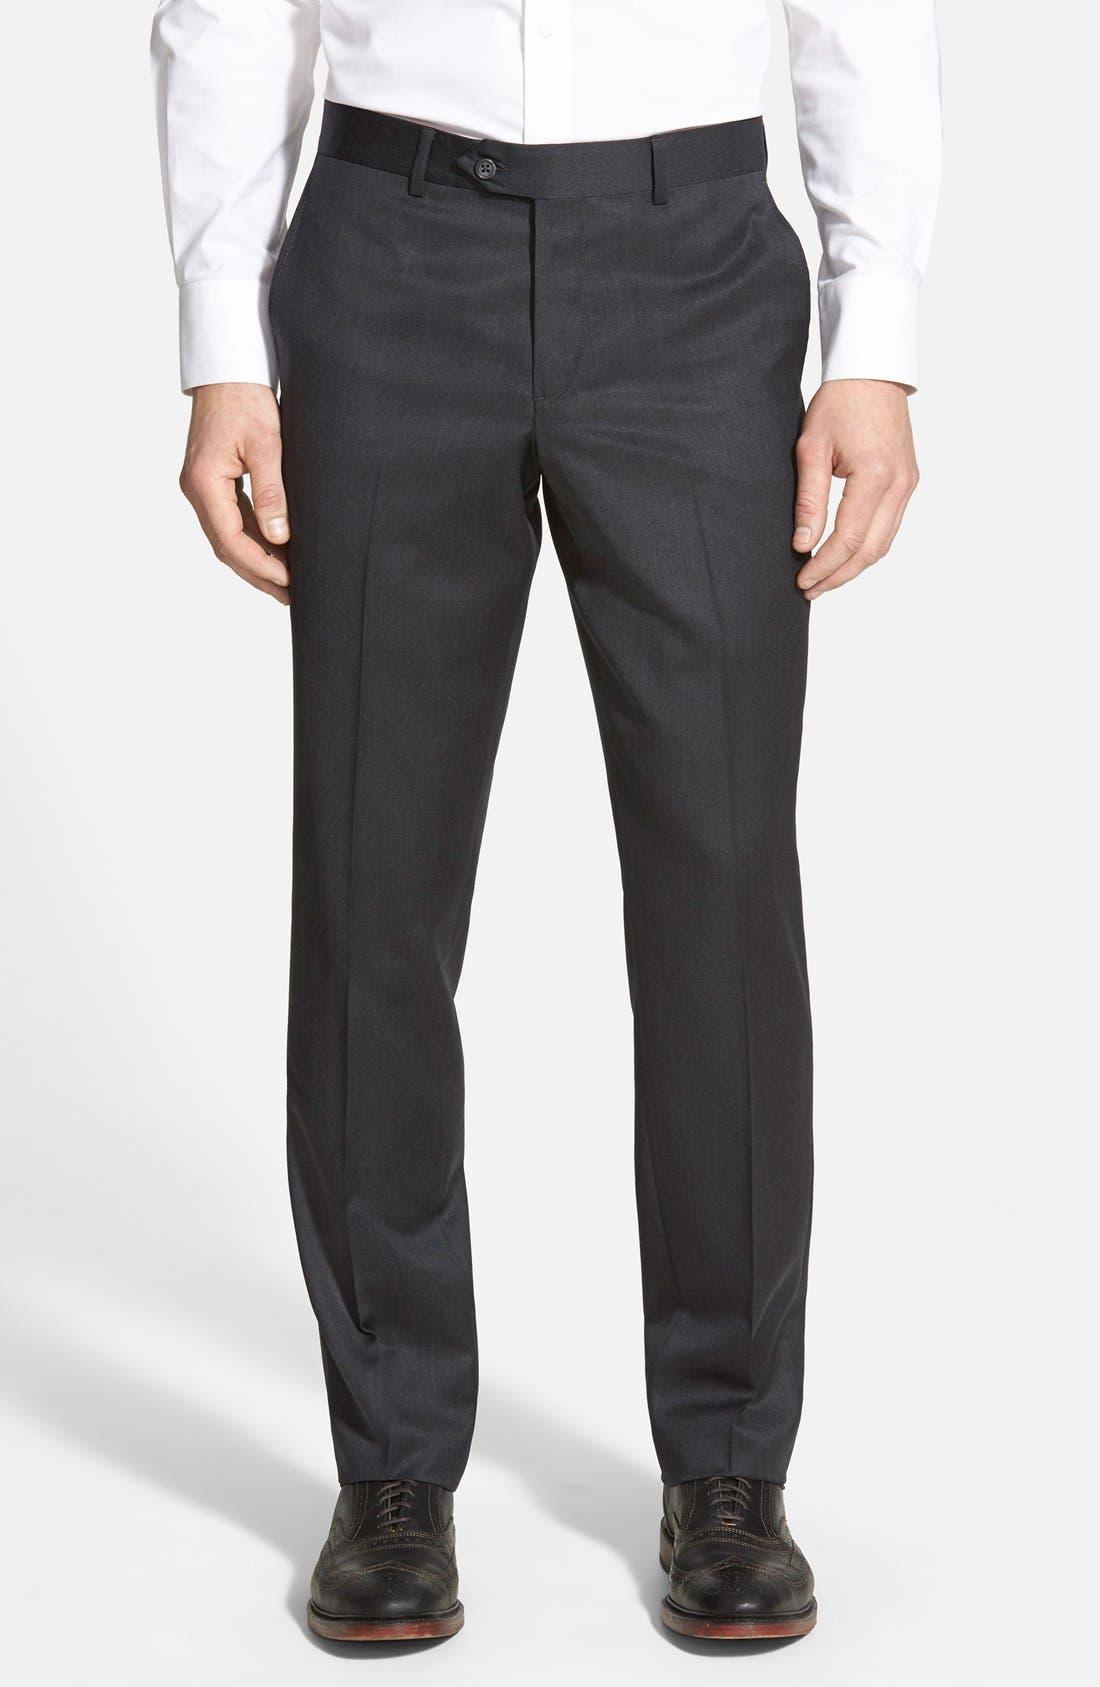 Nordstrom Men's Shop Flat Front Wool Trousers